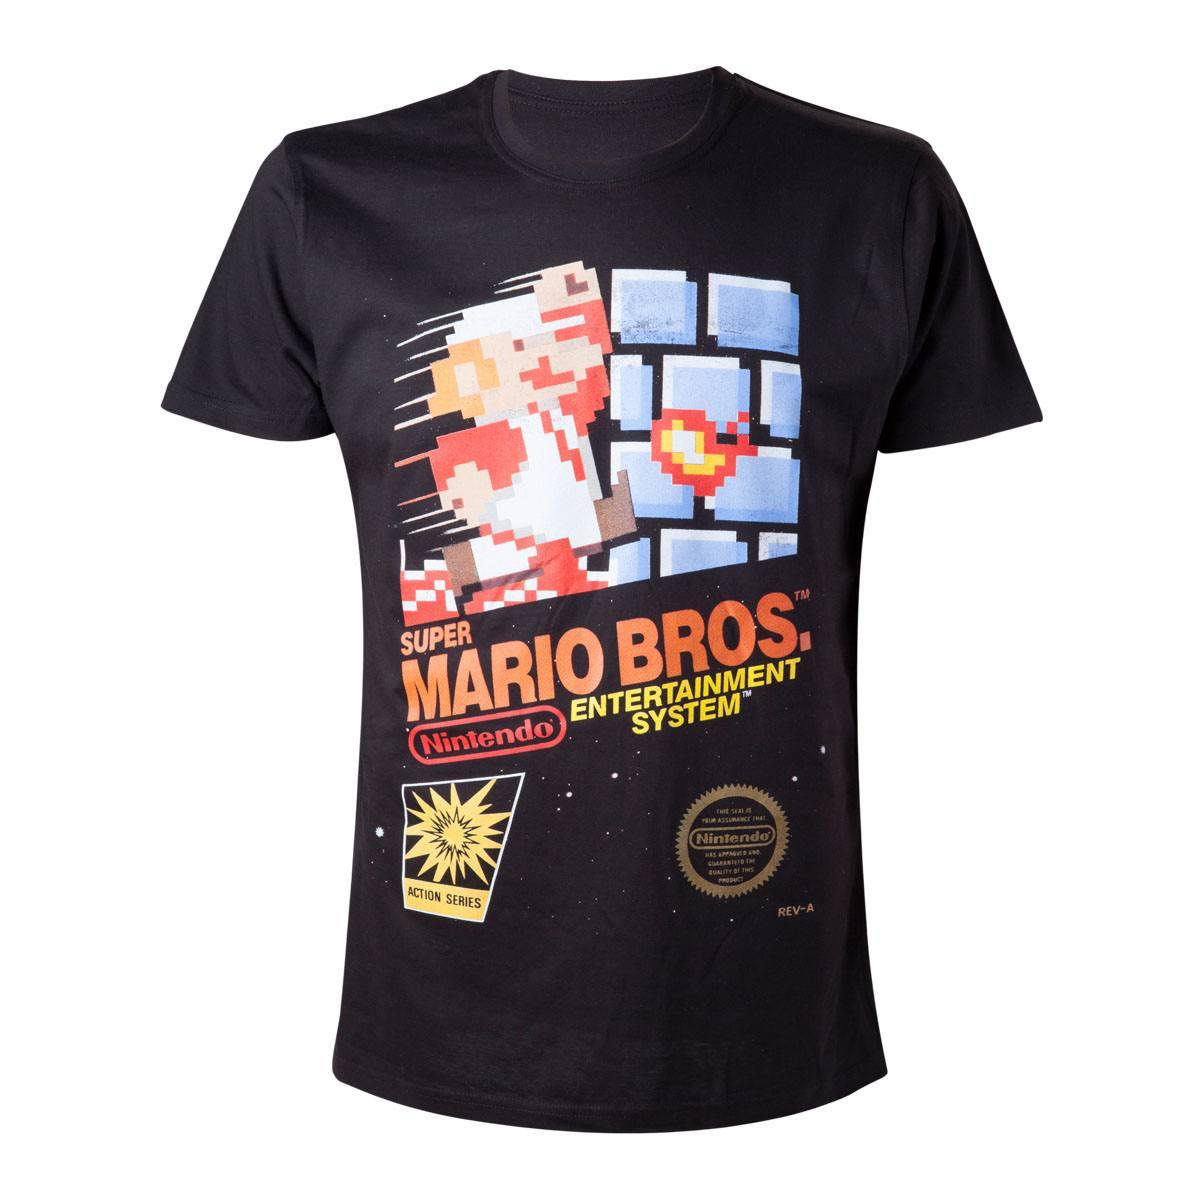 Super Mario Bros. T-Shirt Entertainment System Size L